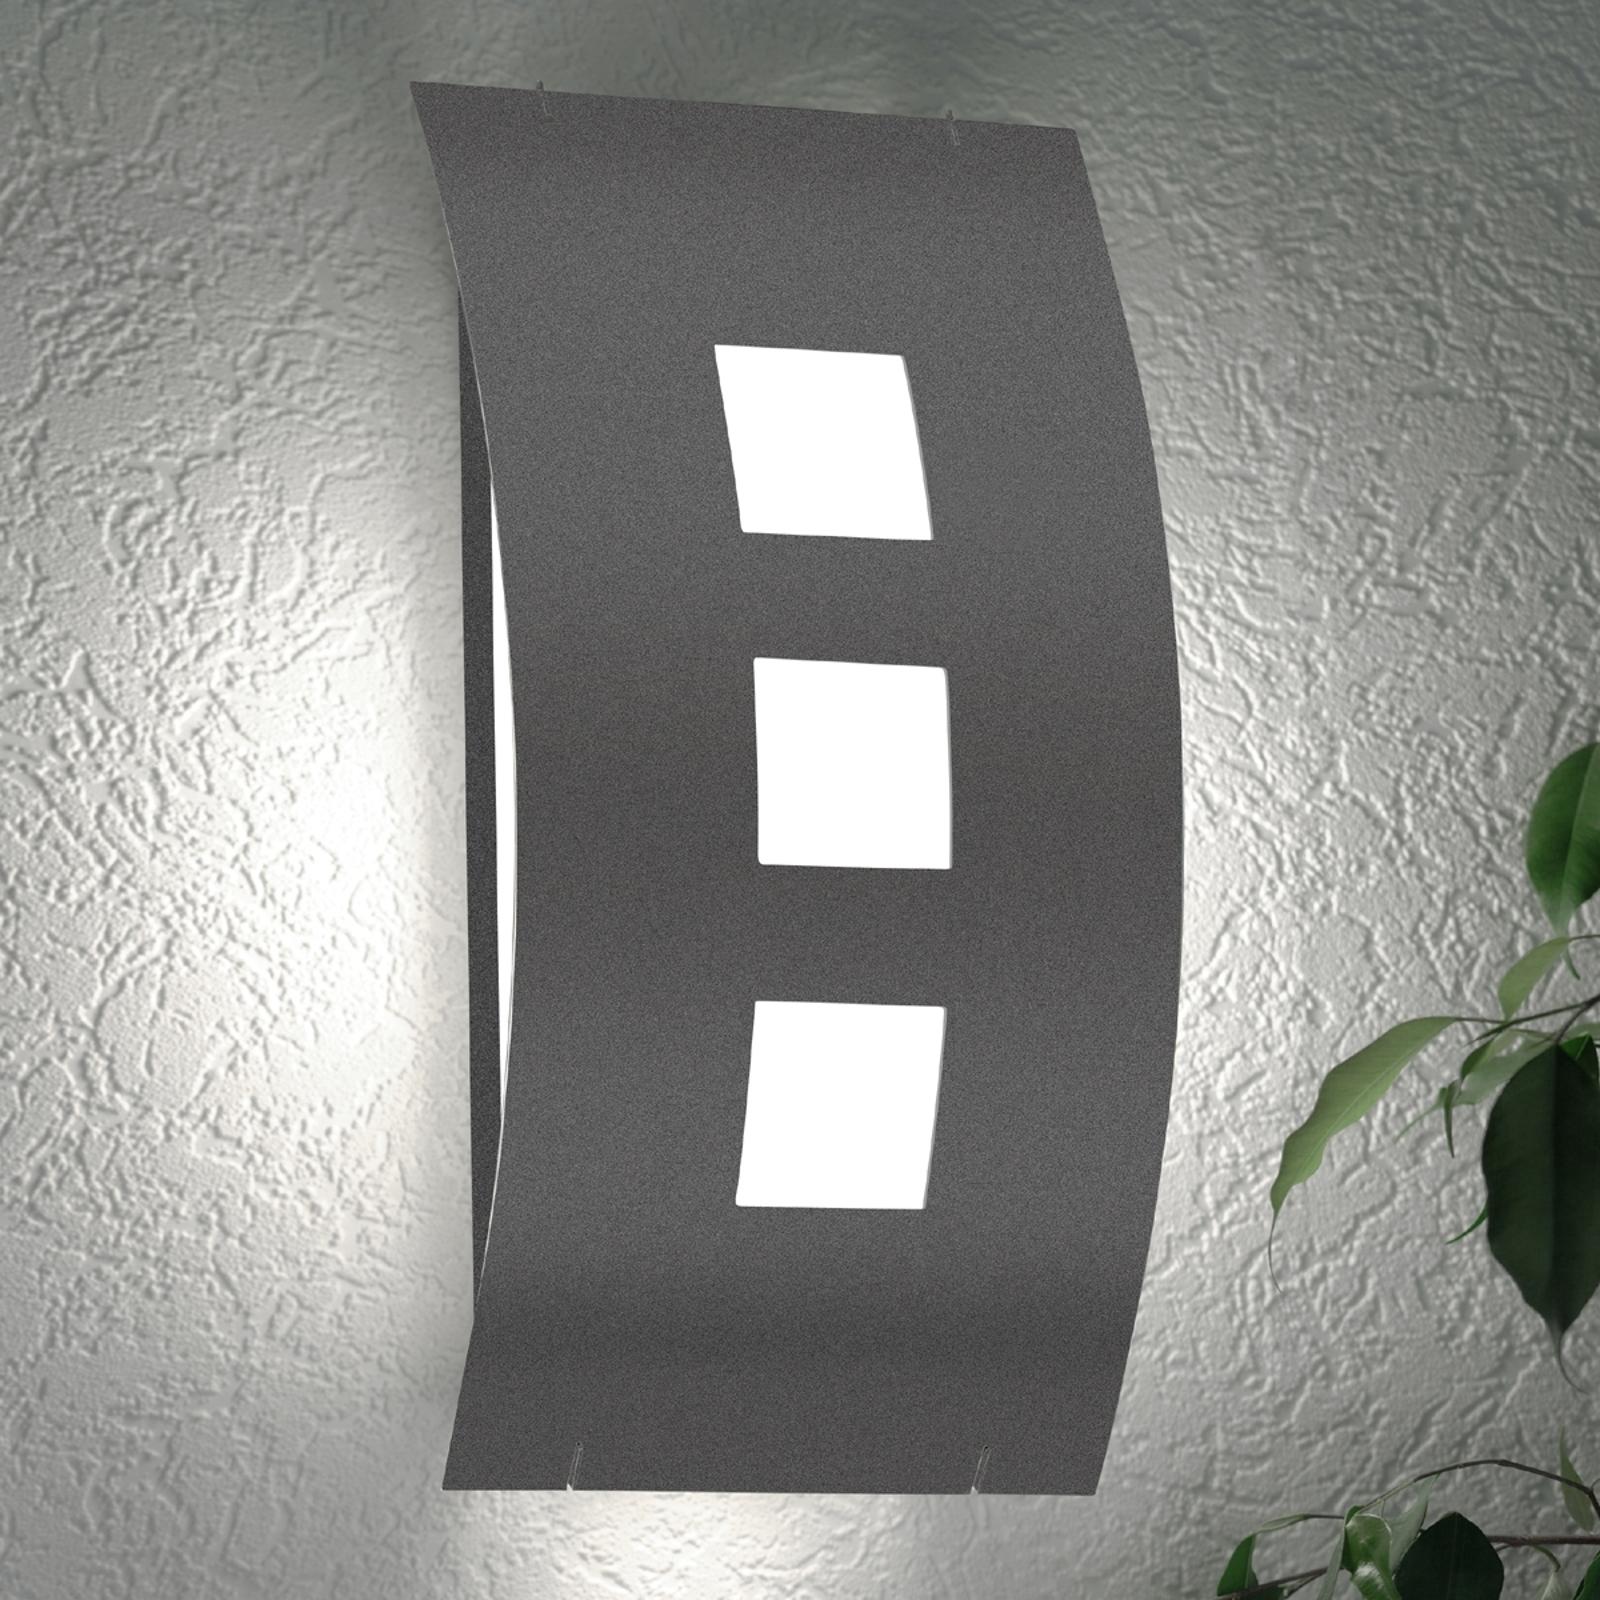 Lampada da parete per esterni Graal RAL7016